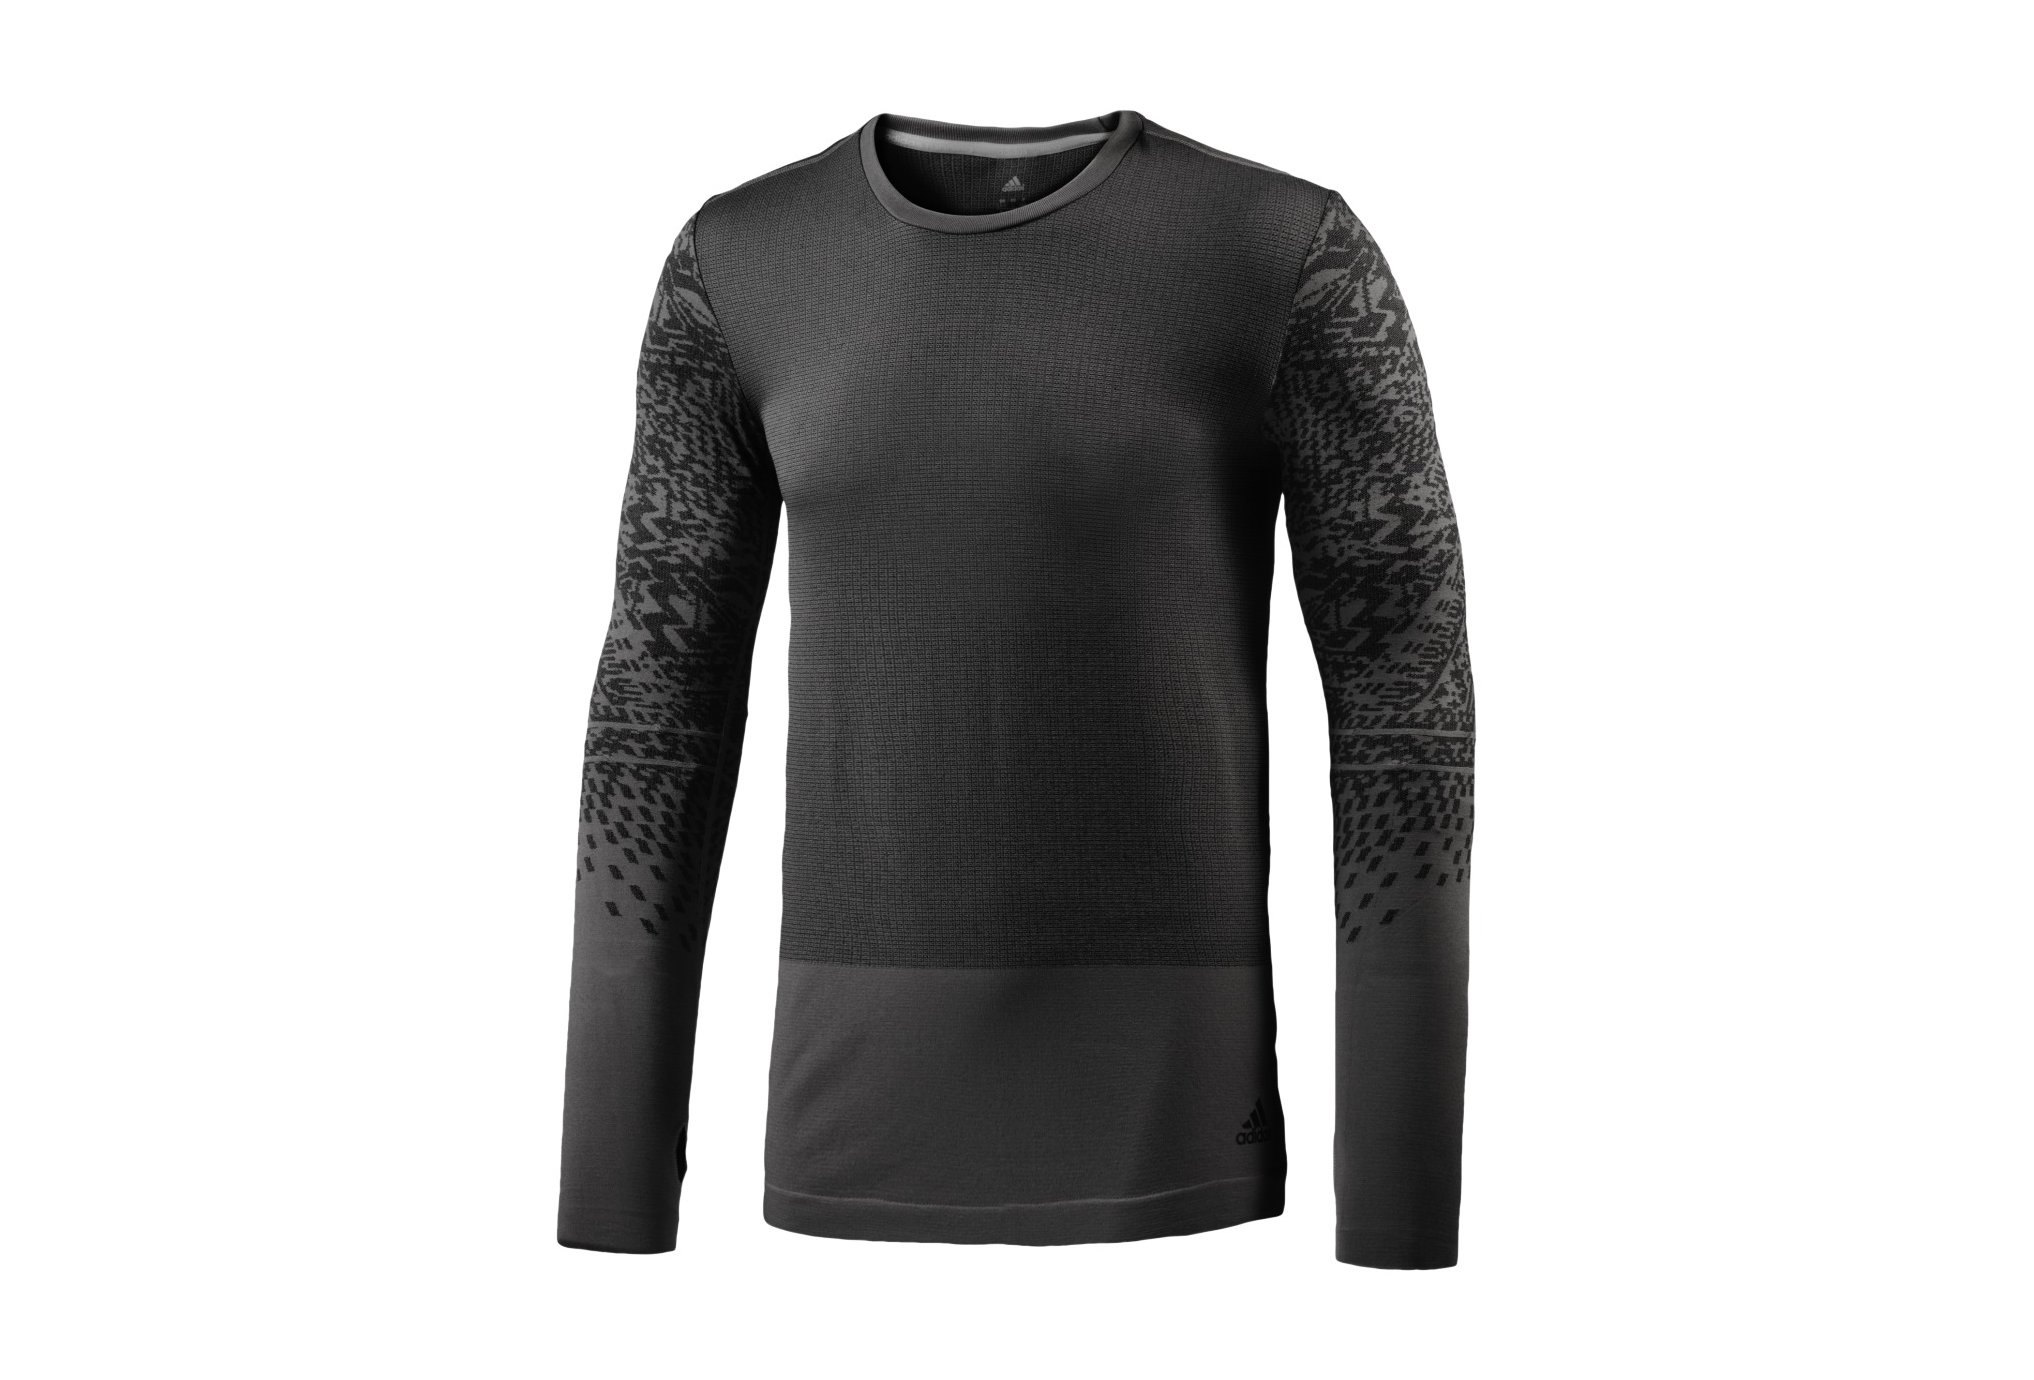 adidas Tee-Shirt Supernova Primeknit M Diététique Vêtements homme